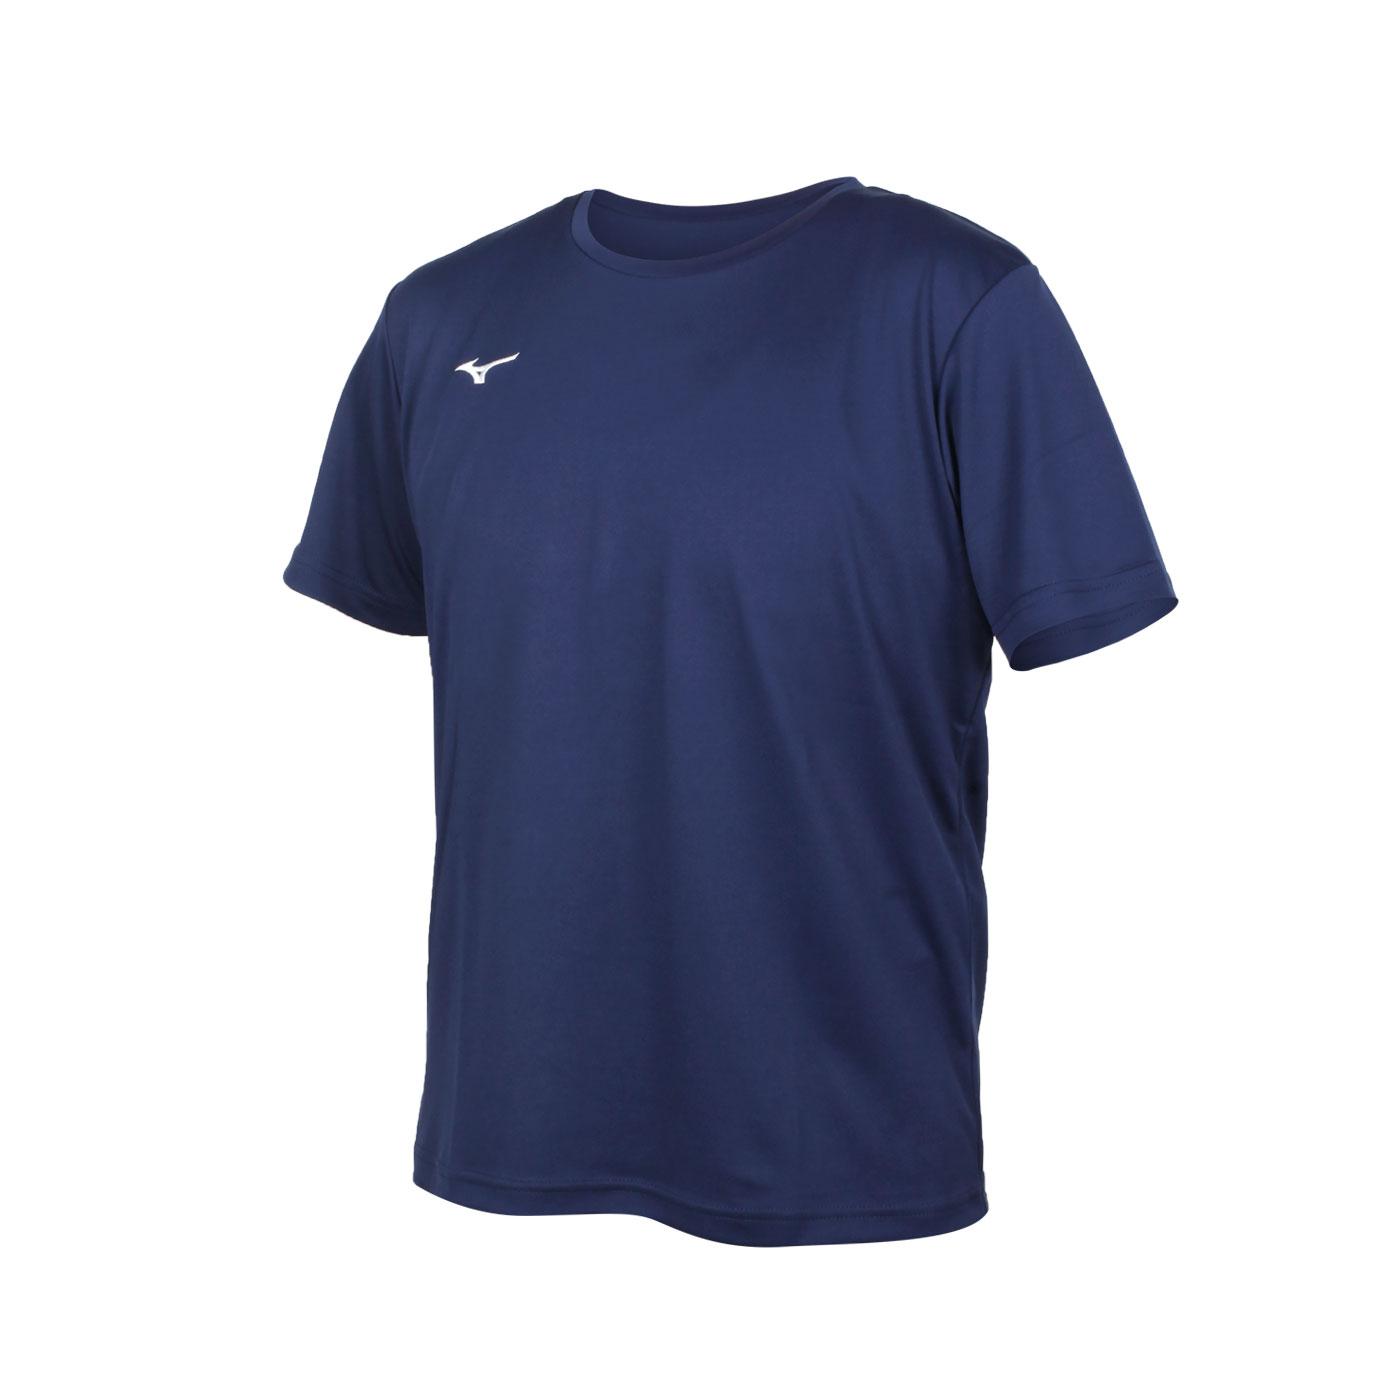 MIZUNO 男款短袖T恤 32TA150714 - 丈青白